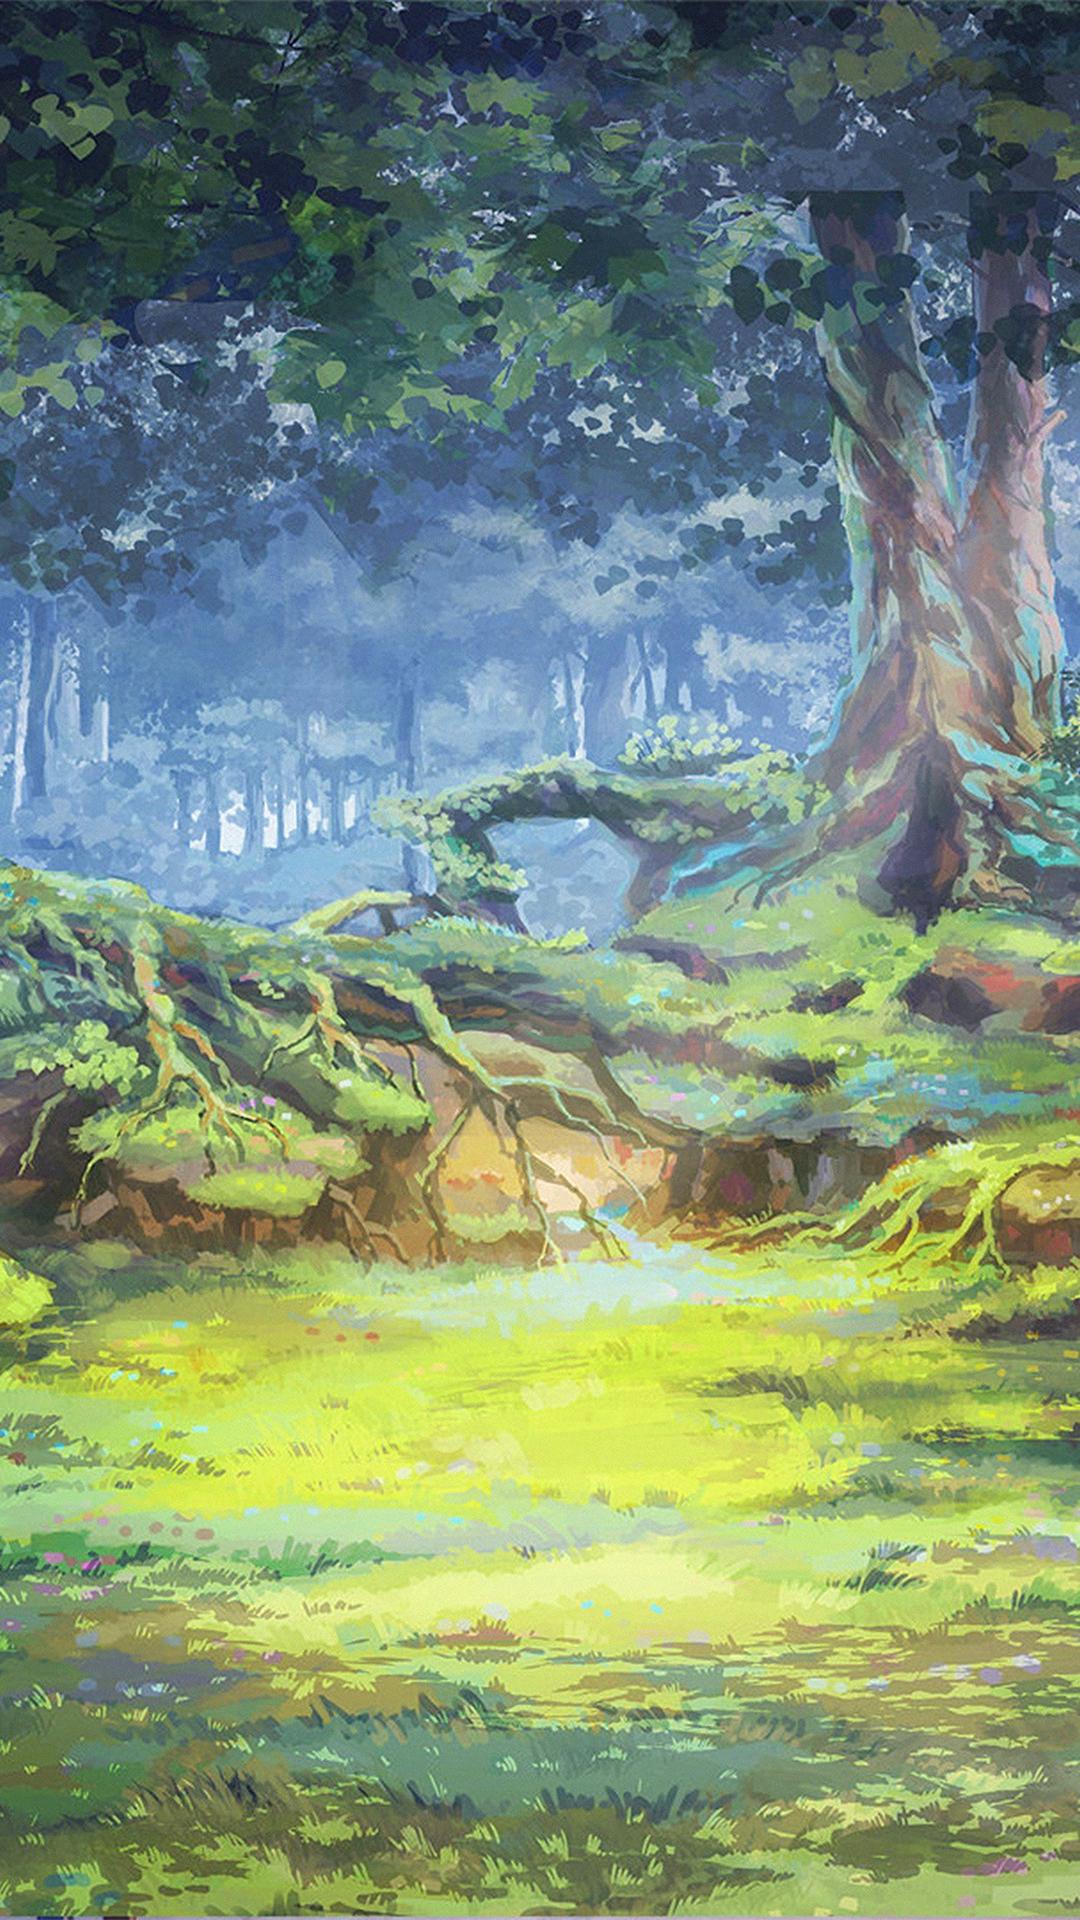 Nature Painting Wallpaper Iphone - HD Wallpaper